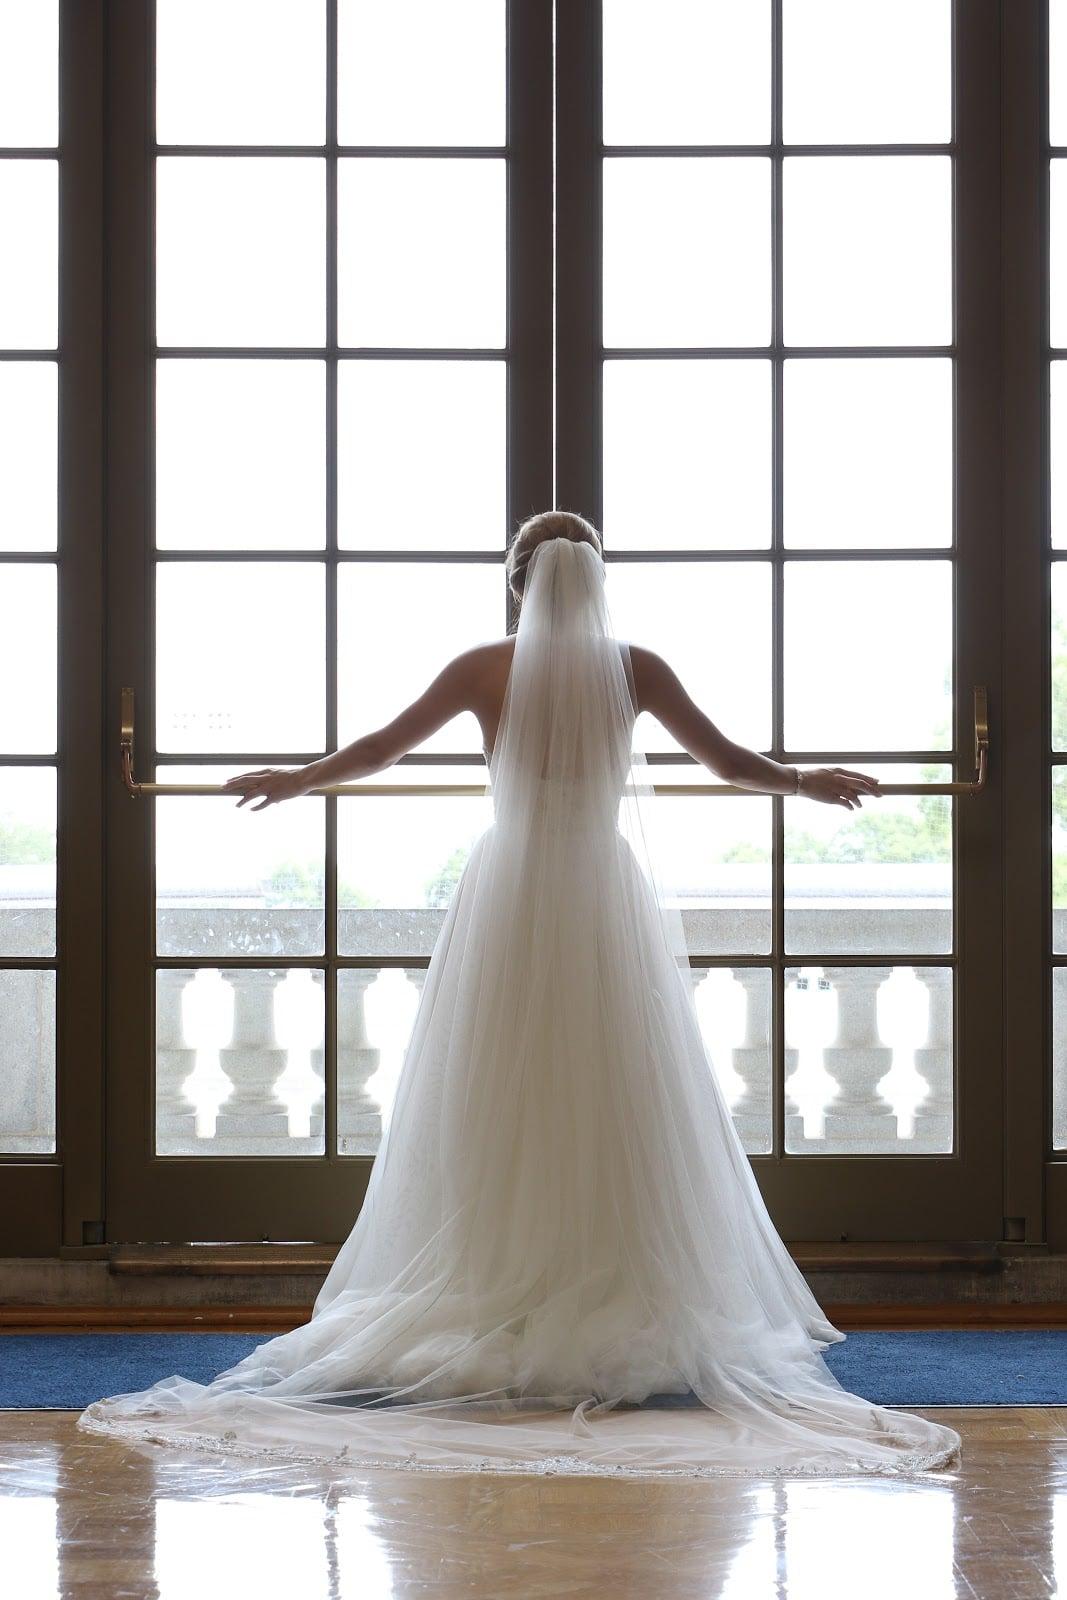 Bride's back in window frame